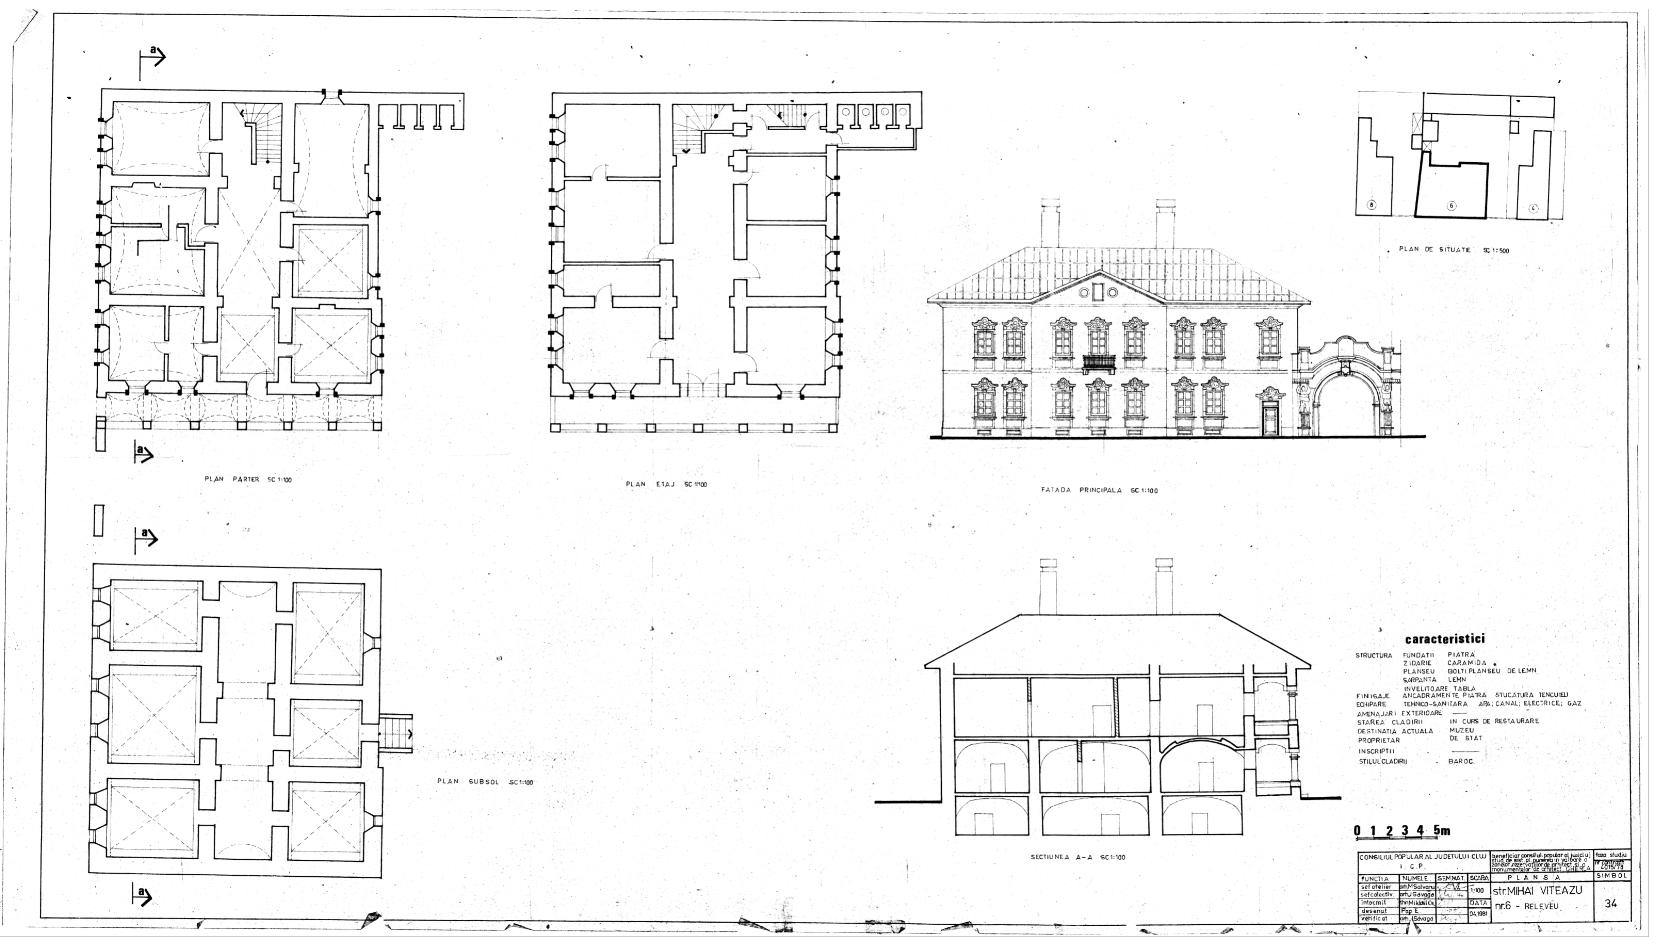 Casa Karatsony Gherla - Mihai Viteazu nr. 6 - Releveu si plan 1972 - Sursa: arh. Claudiu Salanta